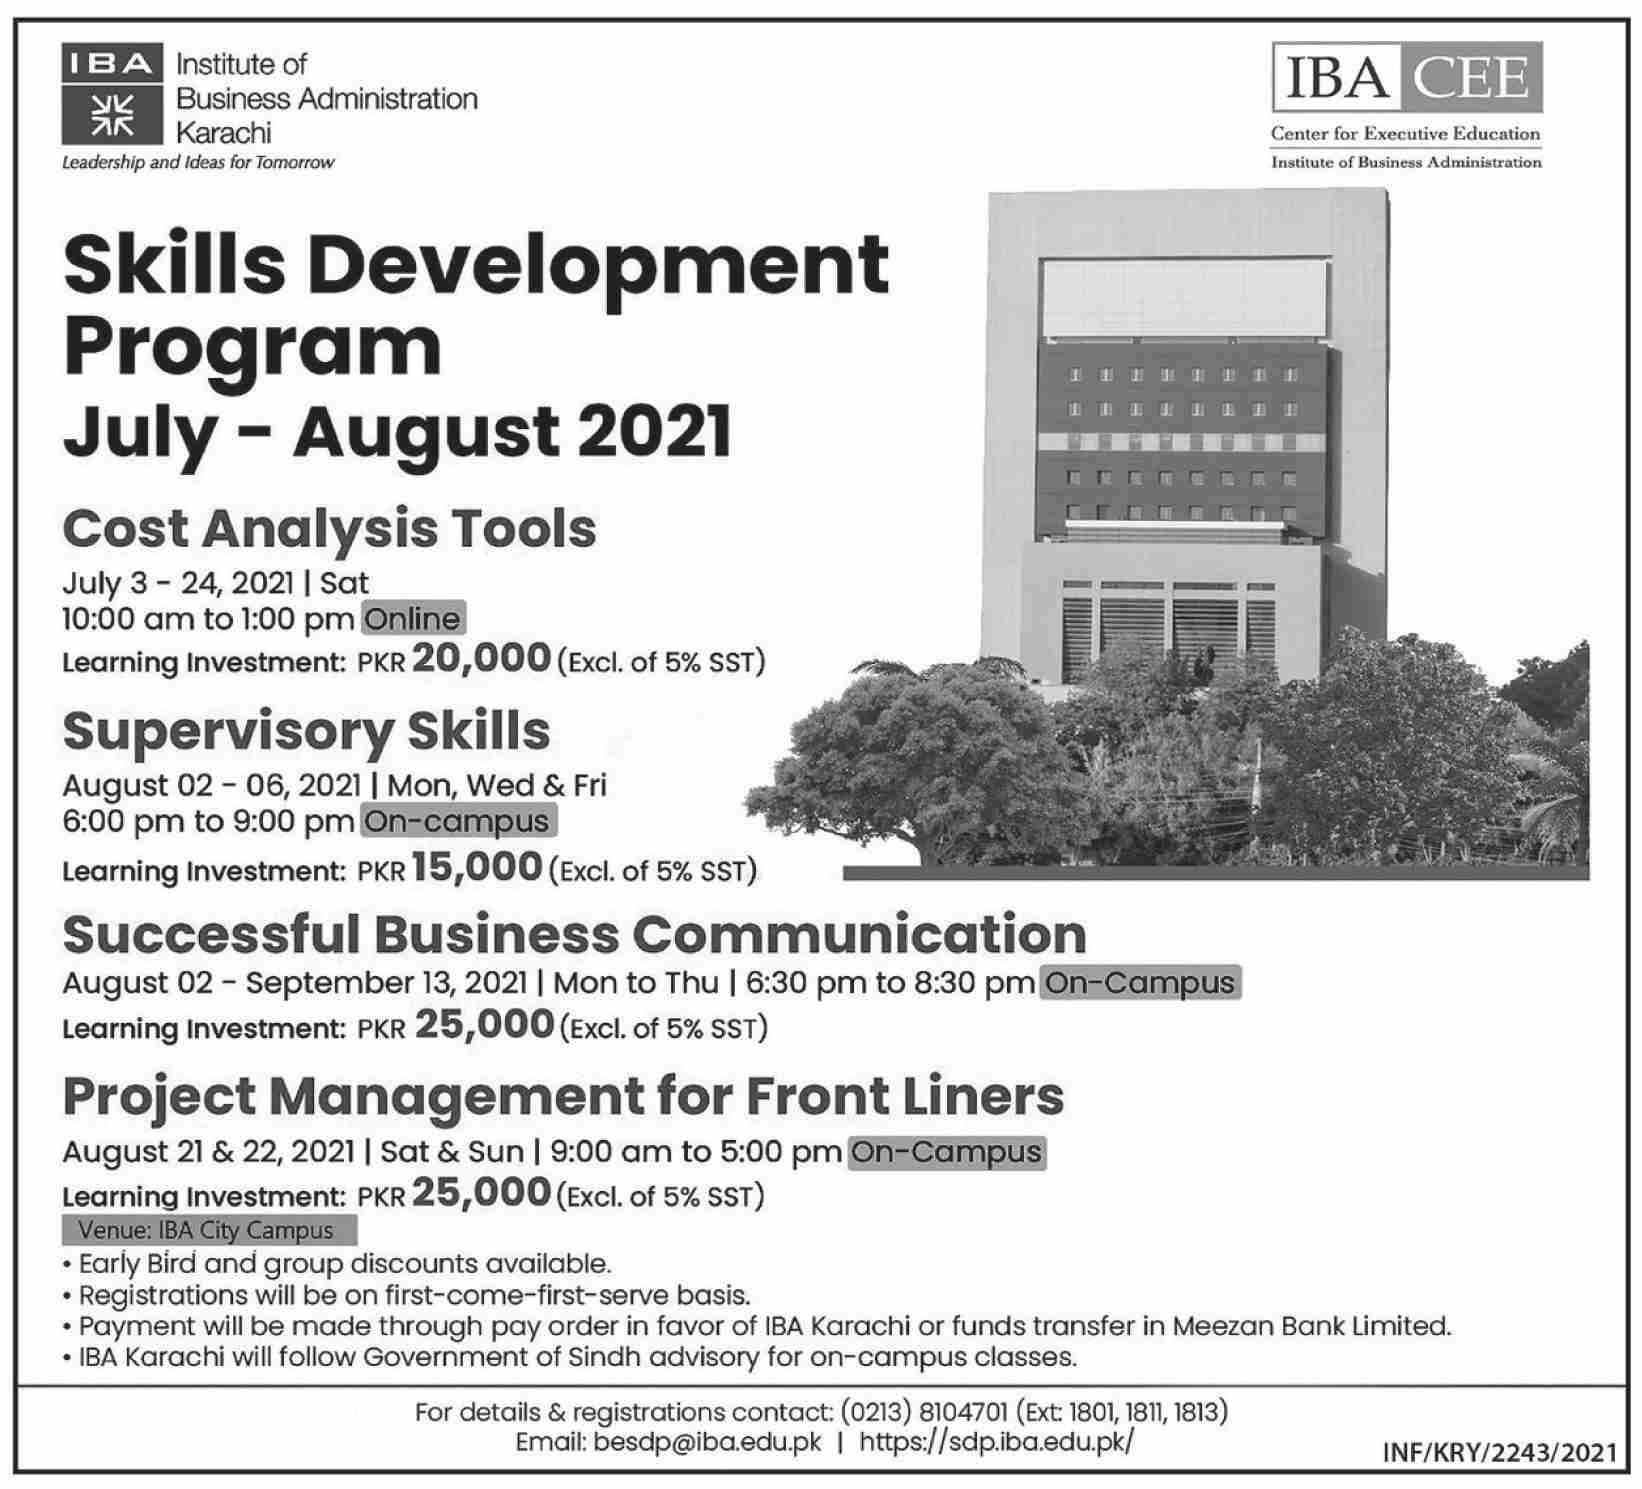 Skill Development Program July-August 2021 IBA